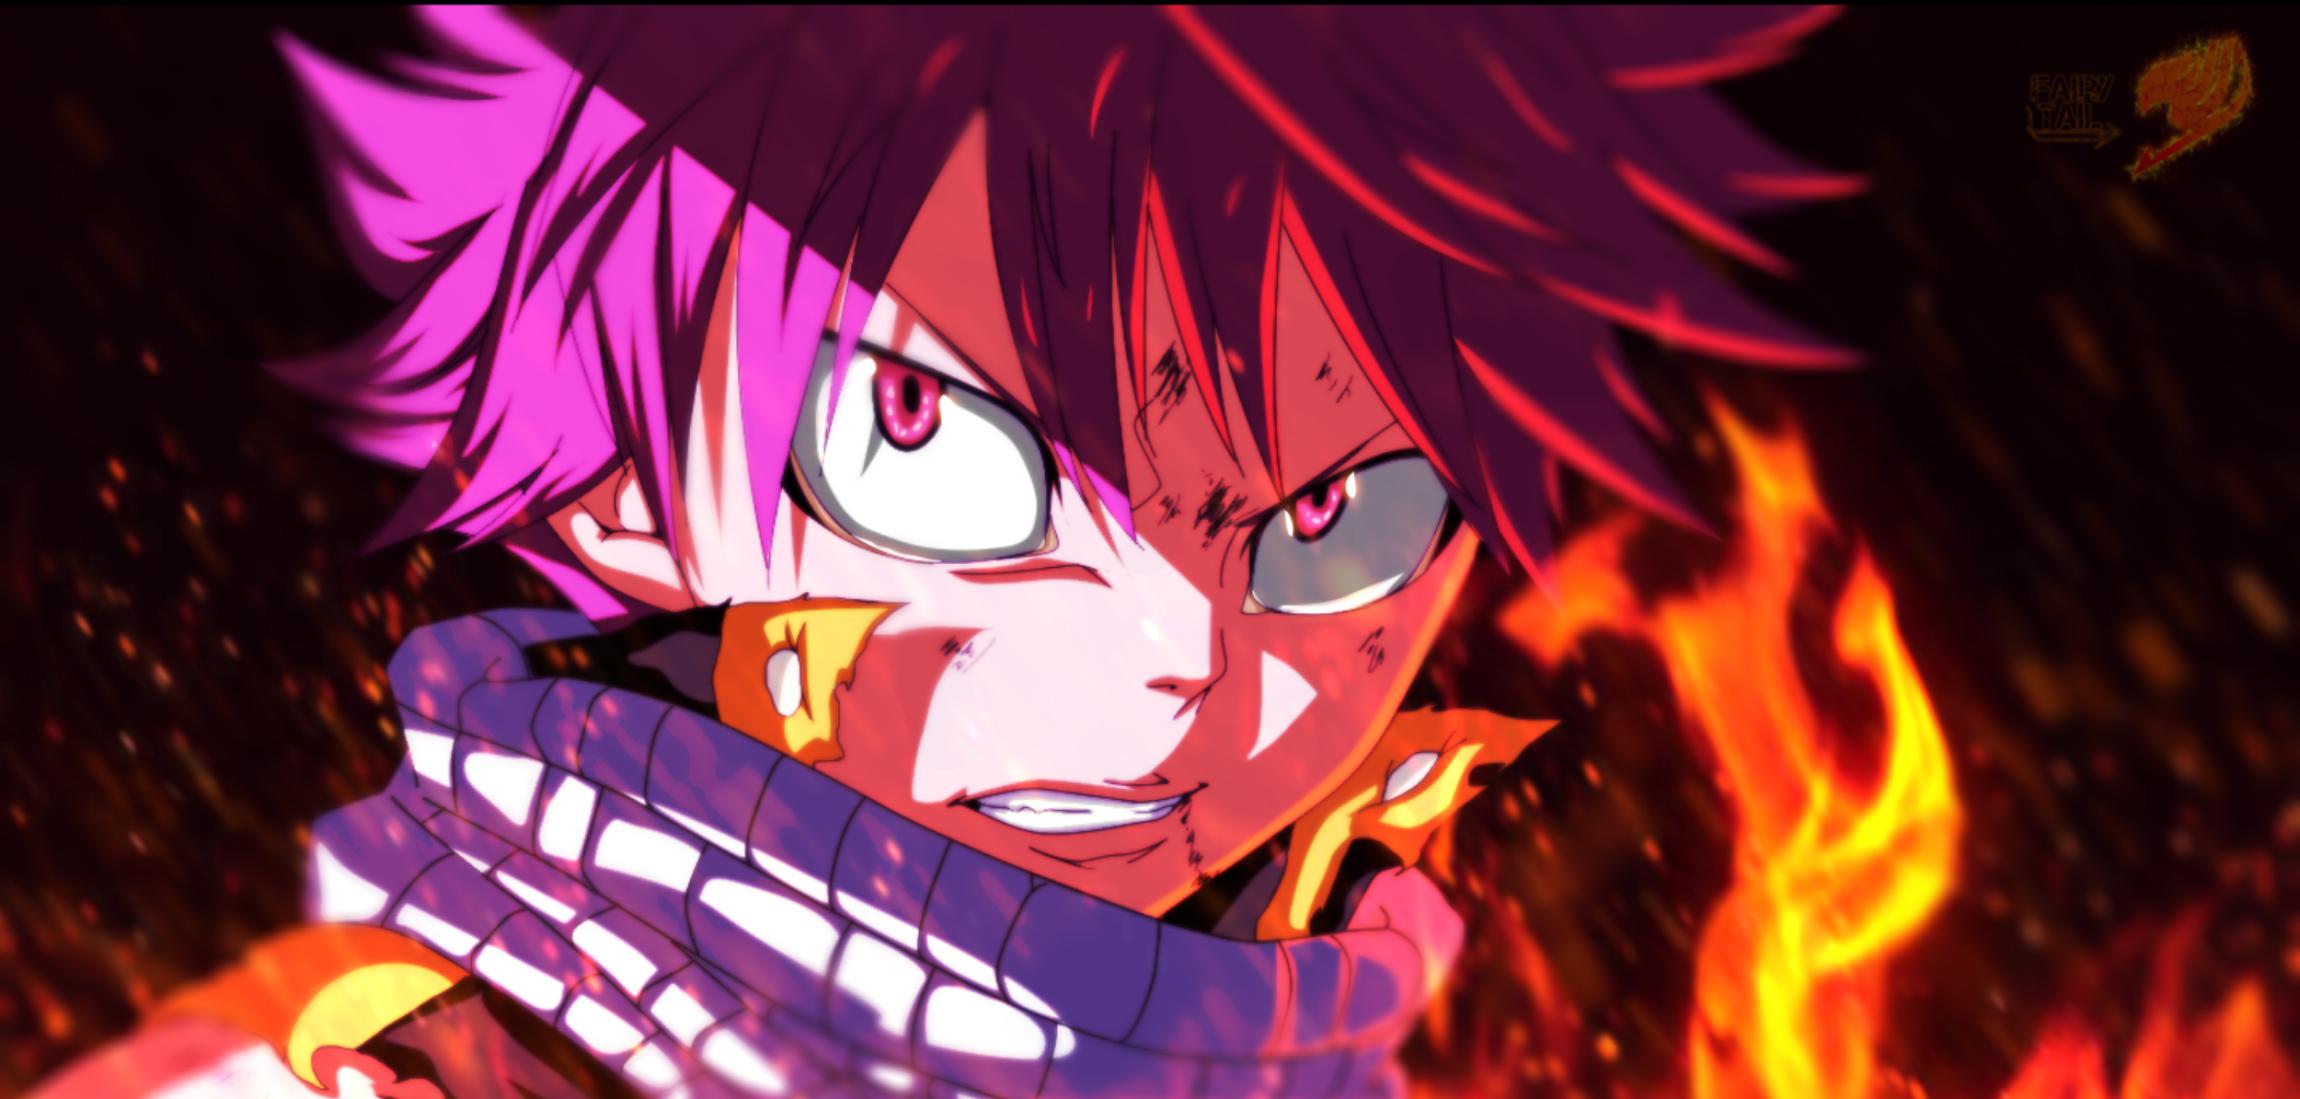 Natsu Dragneel, HD Anime, 4k Wallpapers